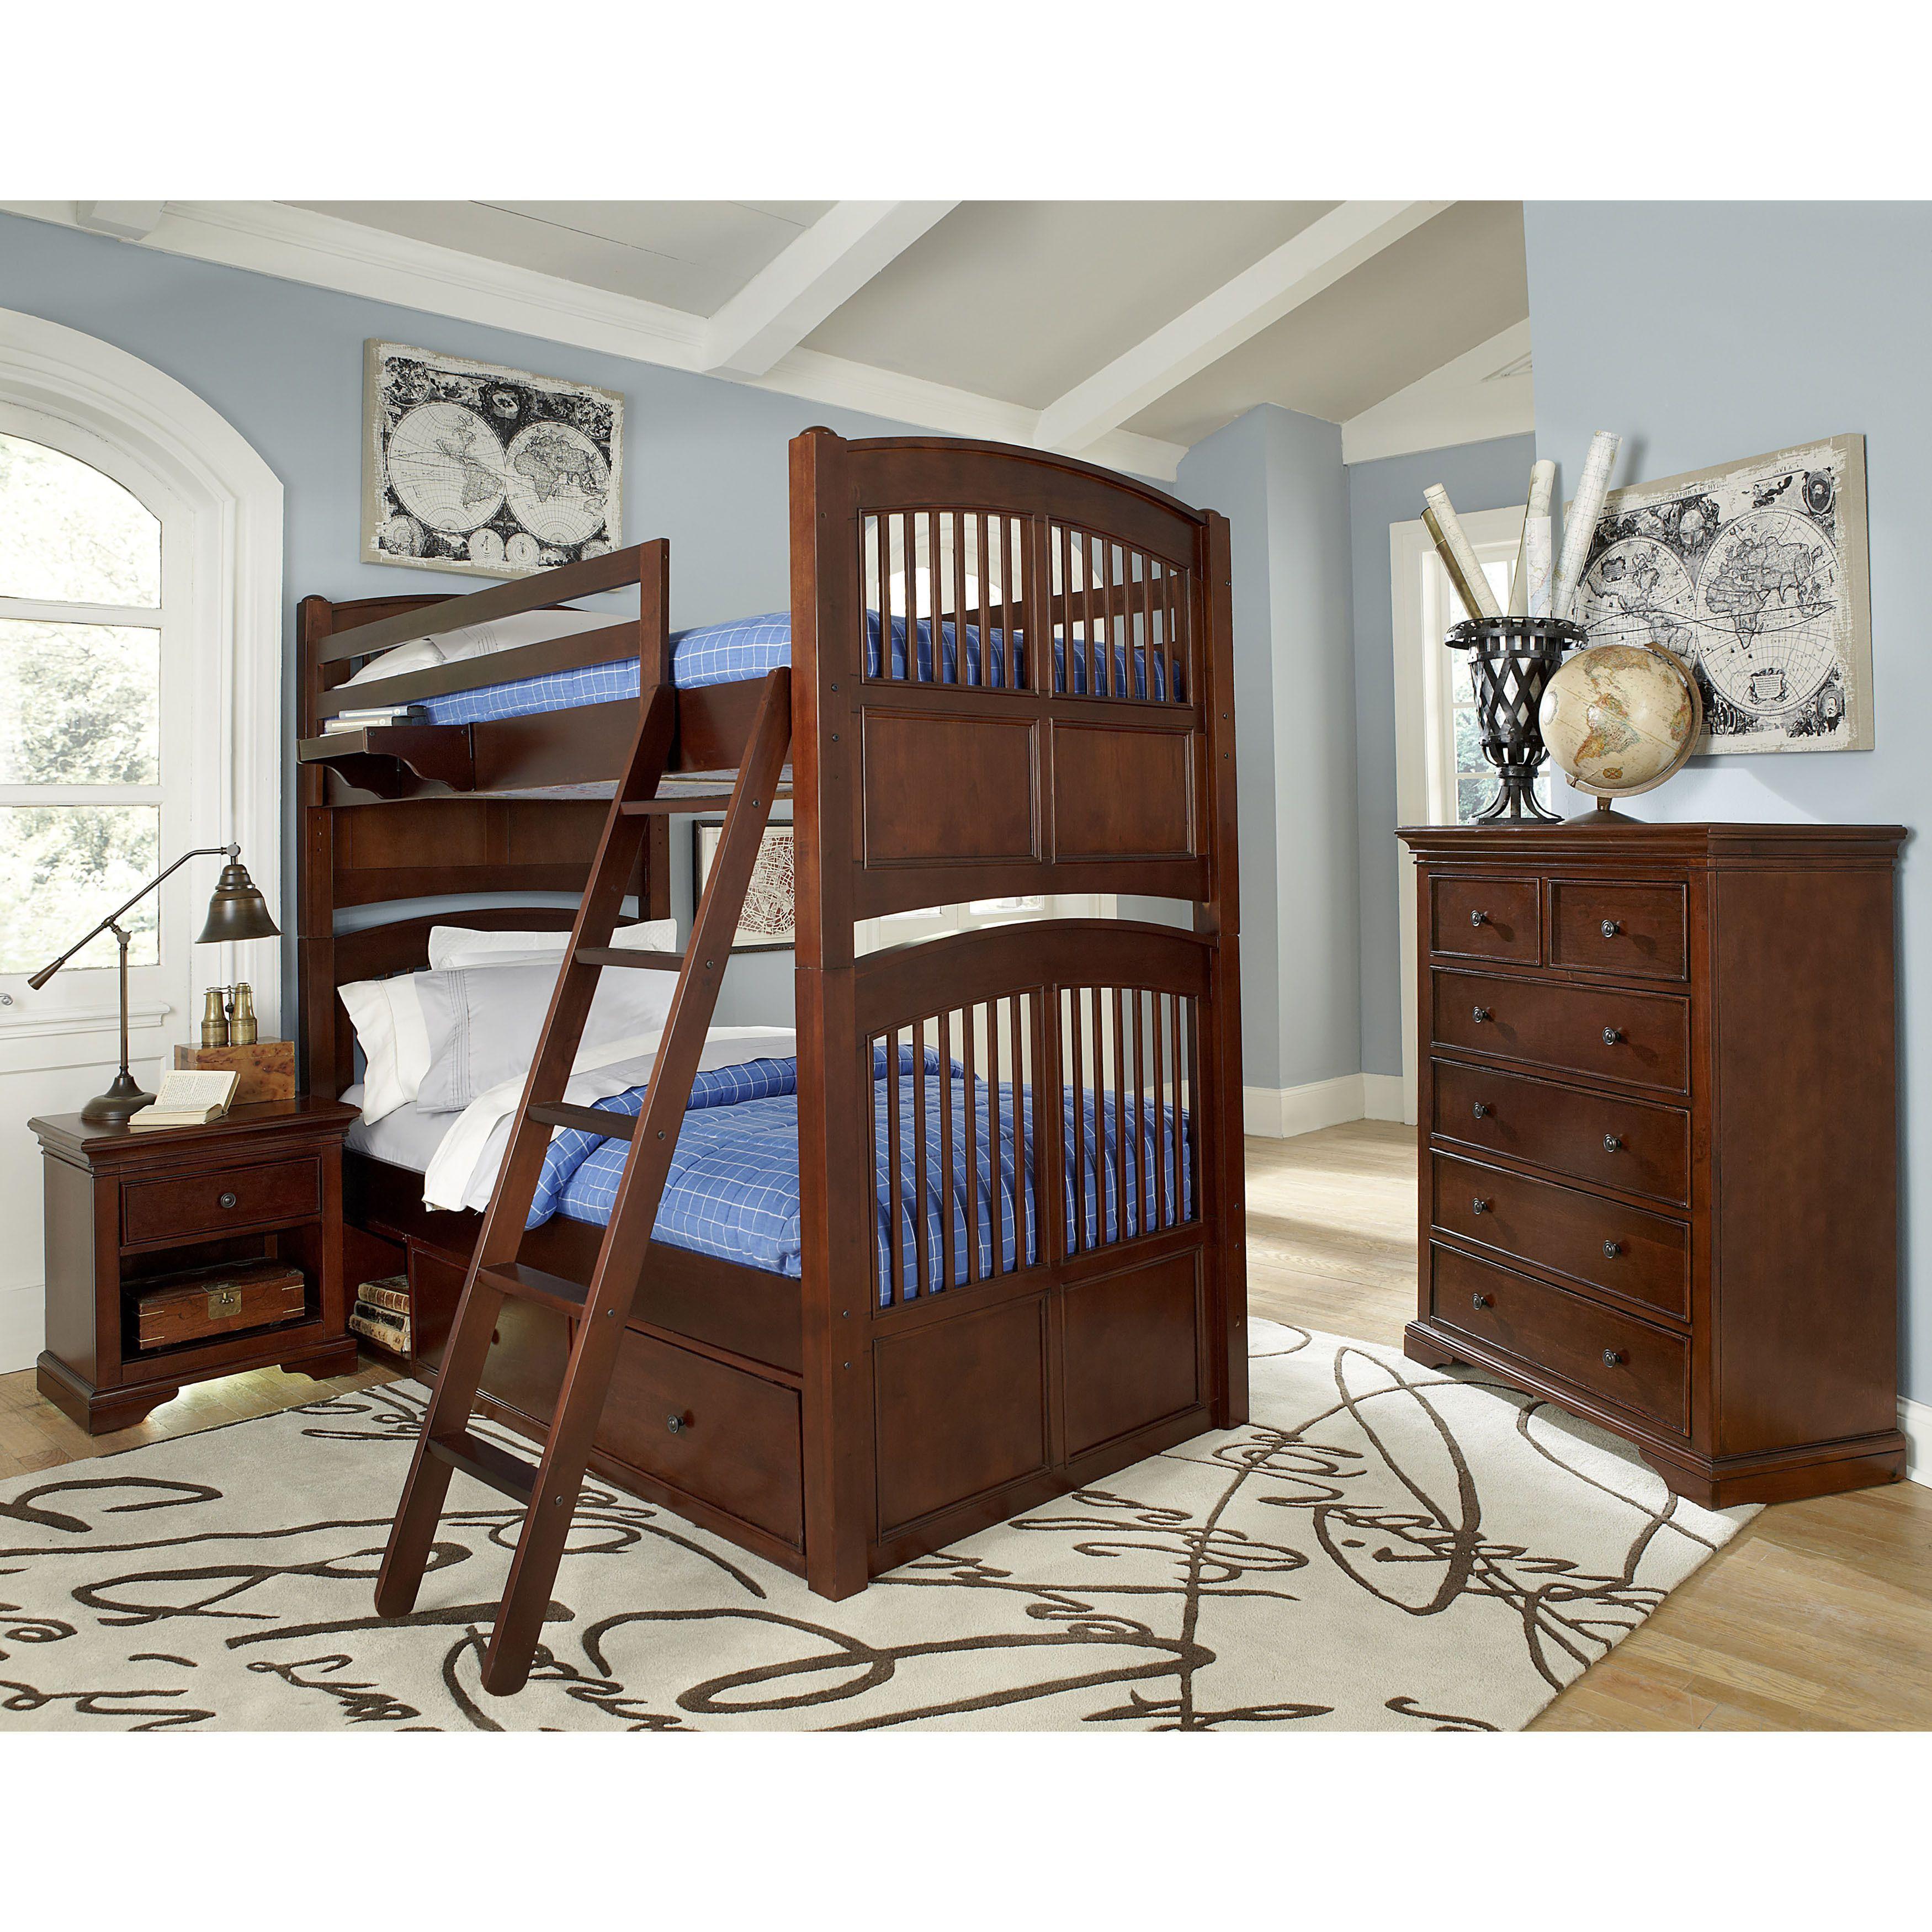 Twin loft bed dimensions  NE Kids Walnut Street Hayden Chestnut Wood Twinovertwin Bunk Bed